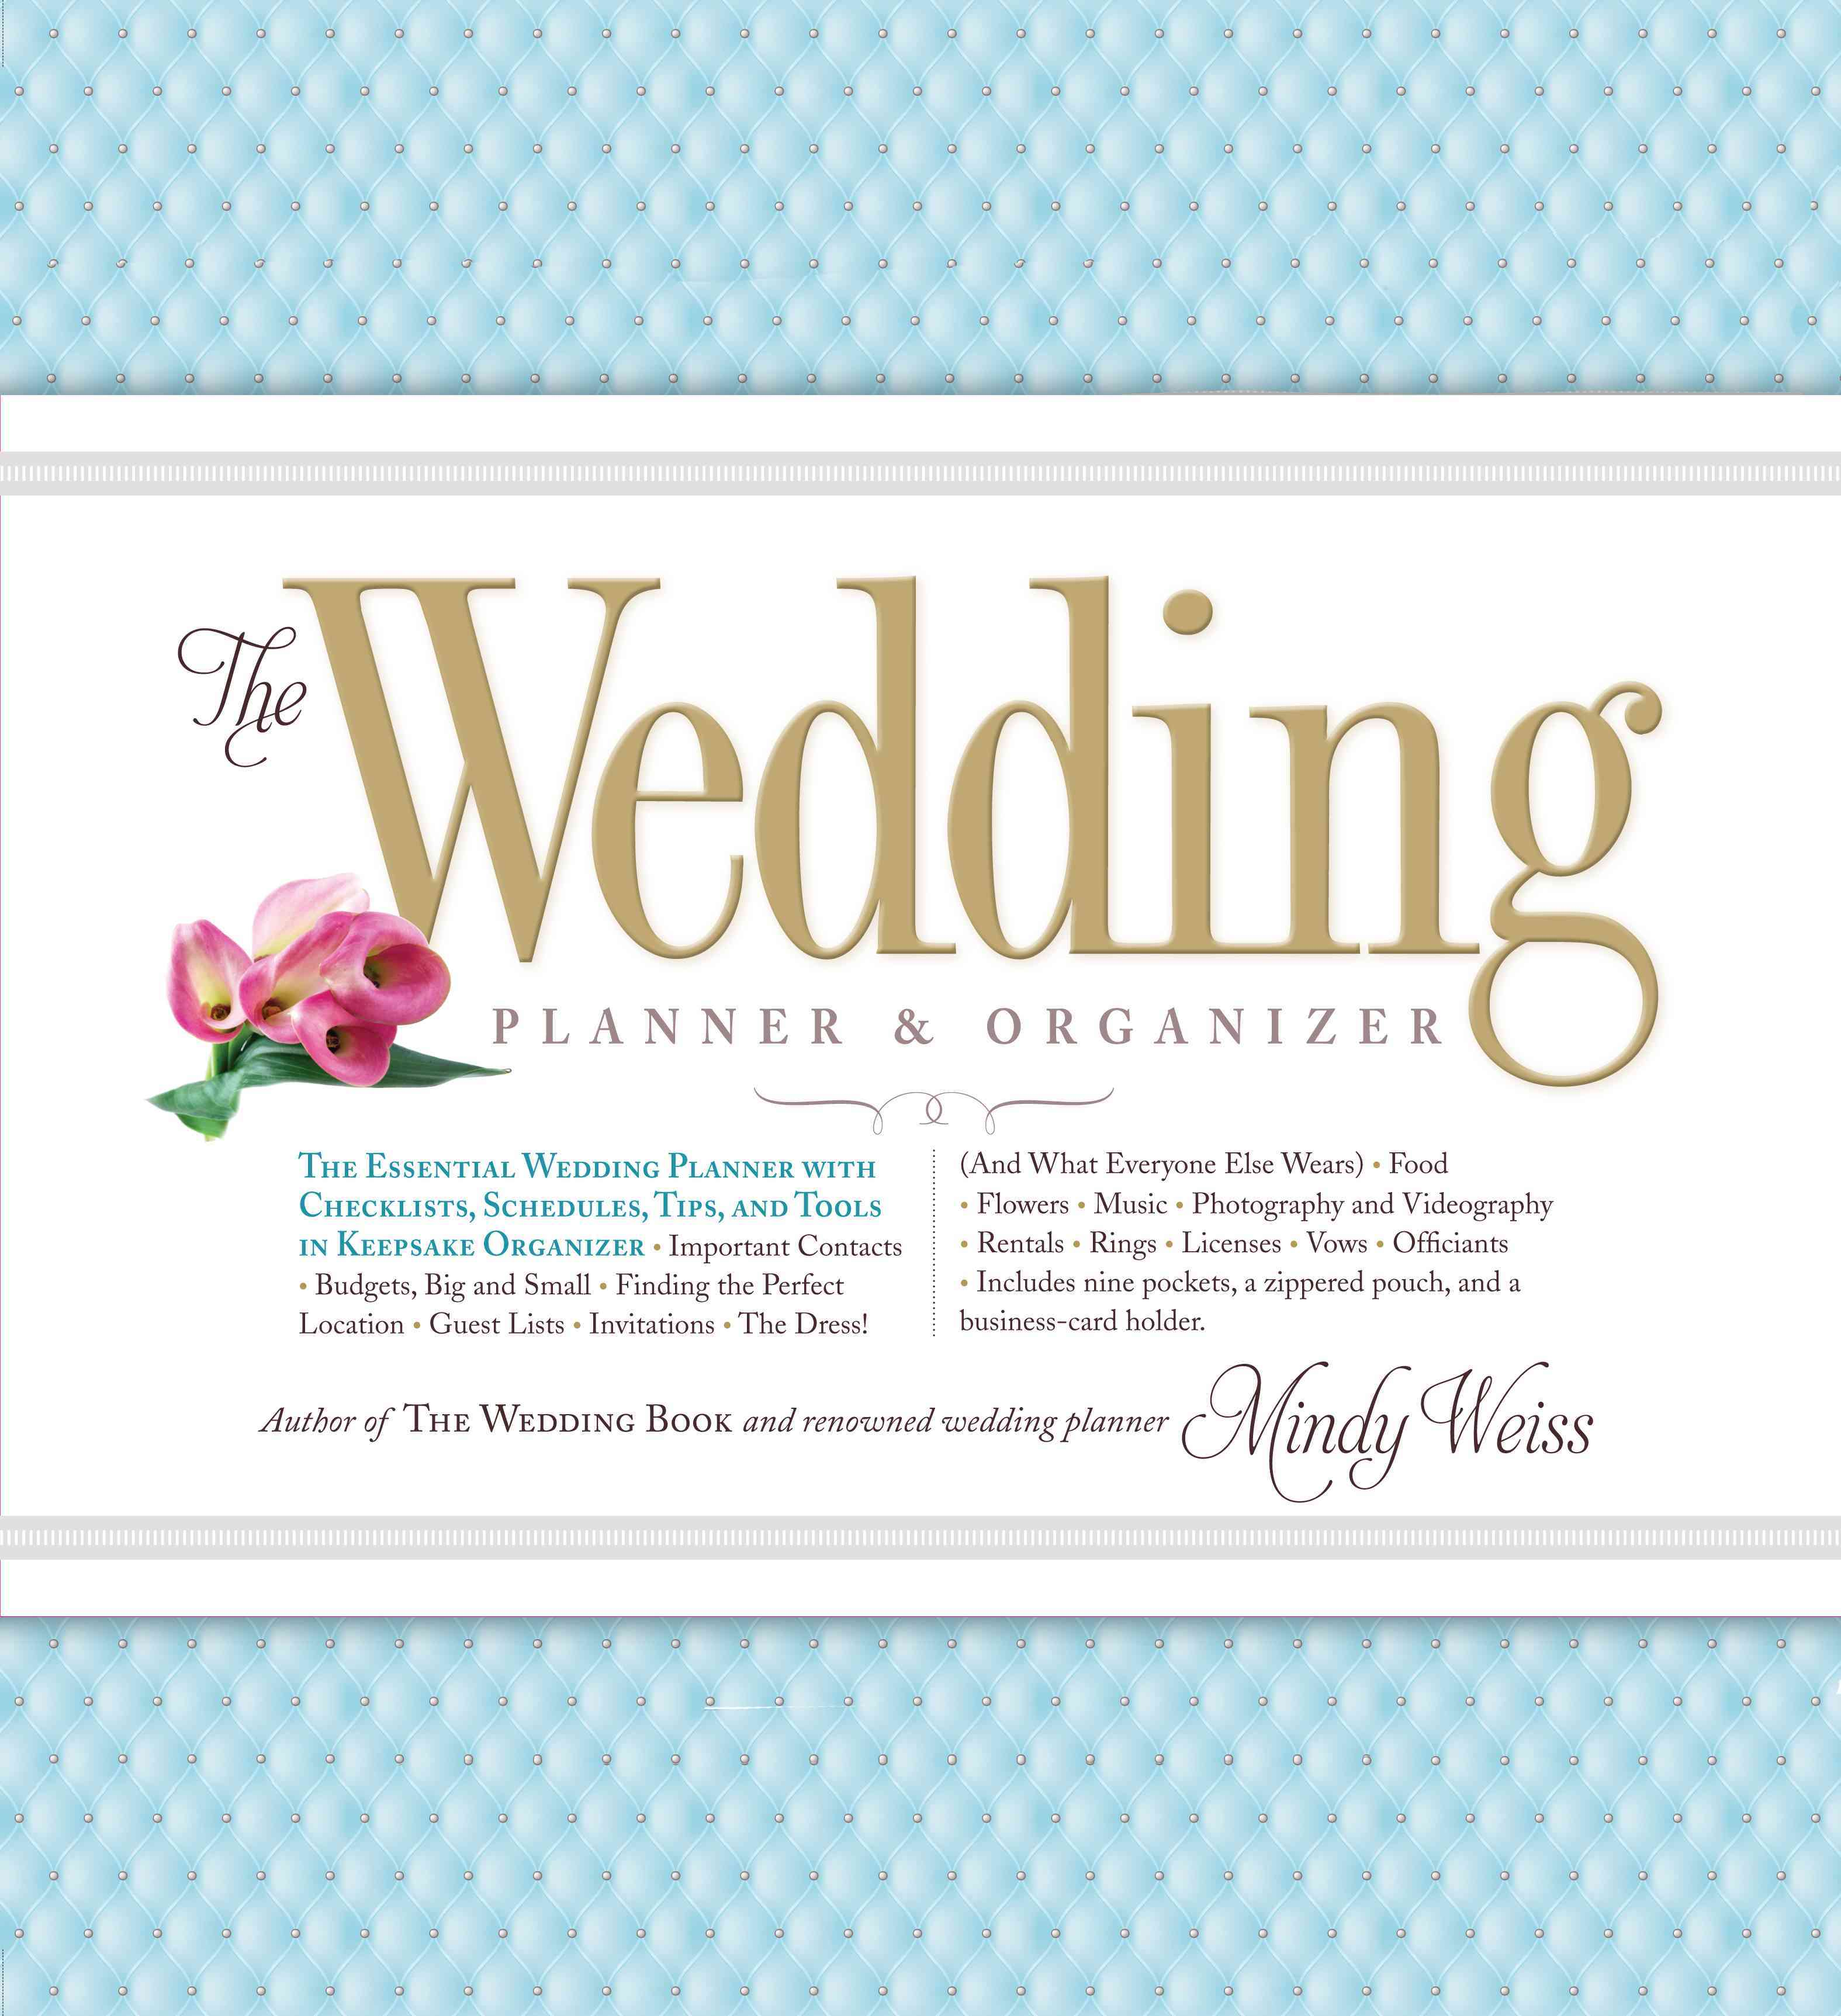 The Wedding Planner & Organizer (Hardcover) - Overstock Shopping ...